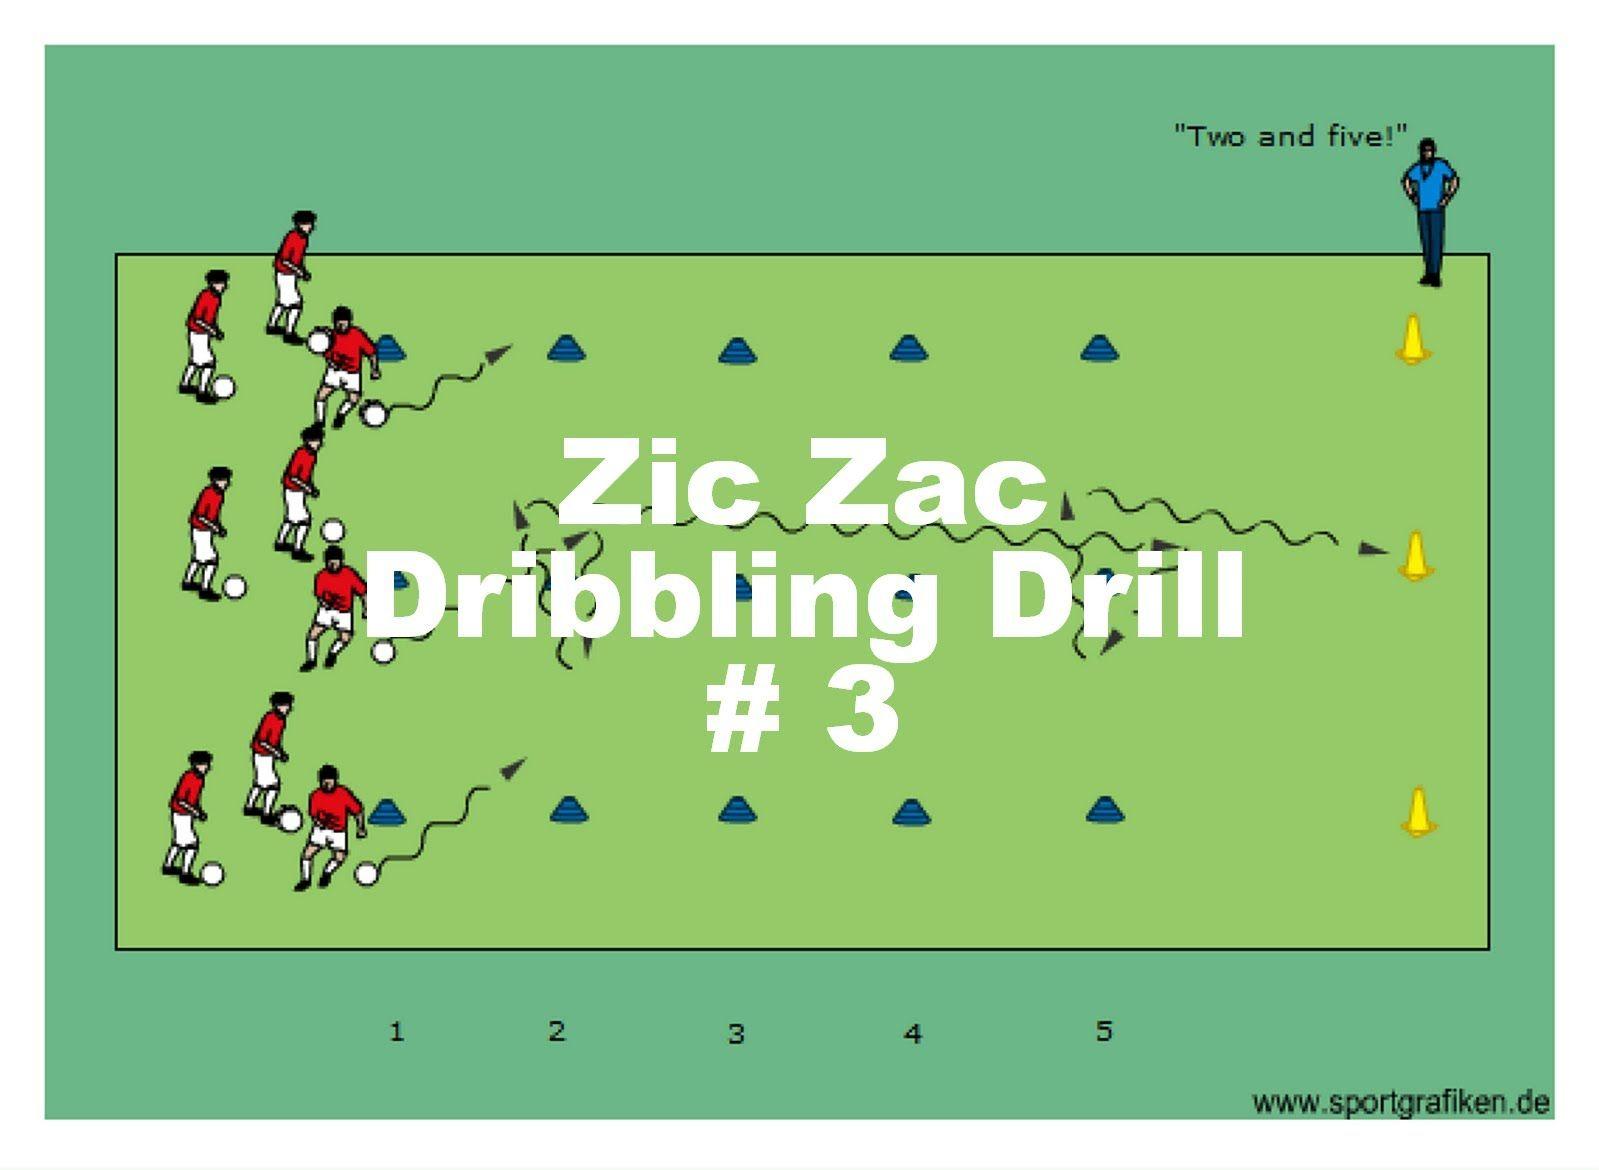 Http Www Top Soccer Drills Com Zig Zac 3 Html Youthsoccerdribblingdrills Soccer Training Soccer Training Drills Soccer Dribbling Drills